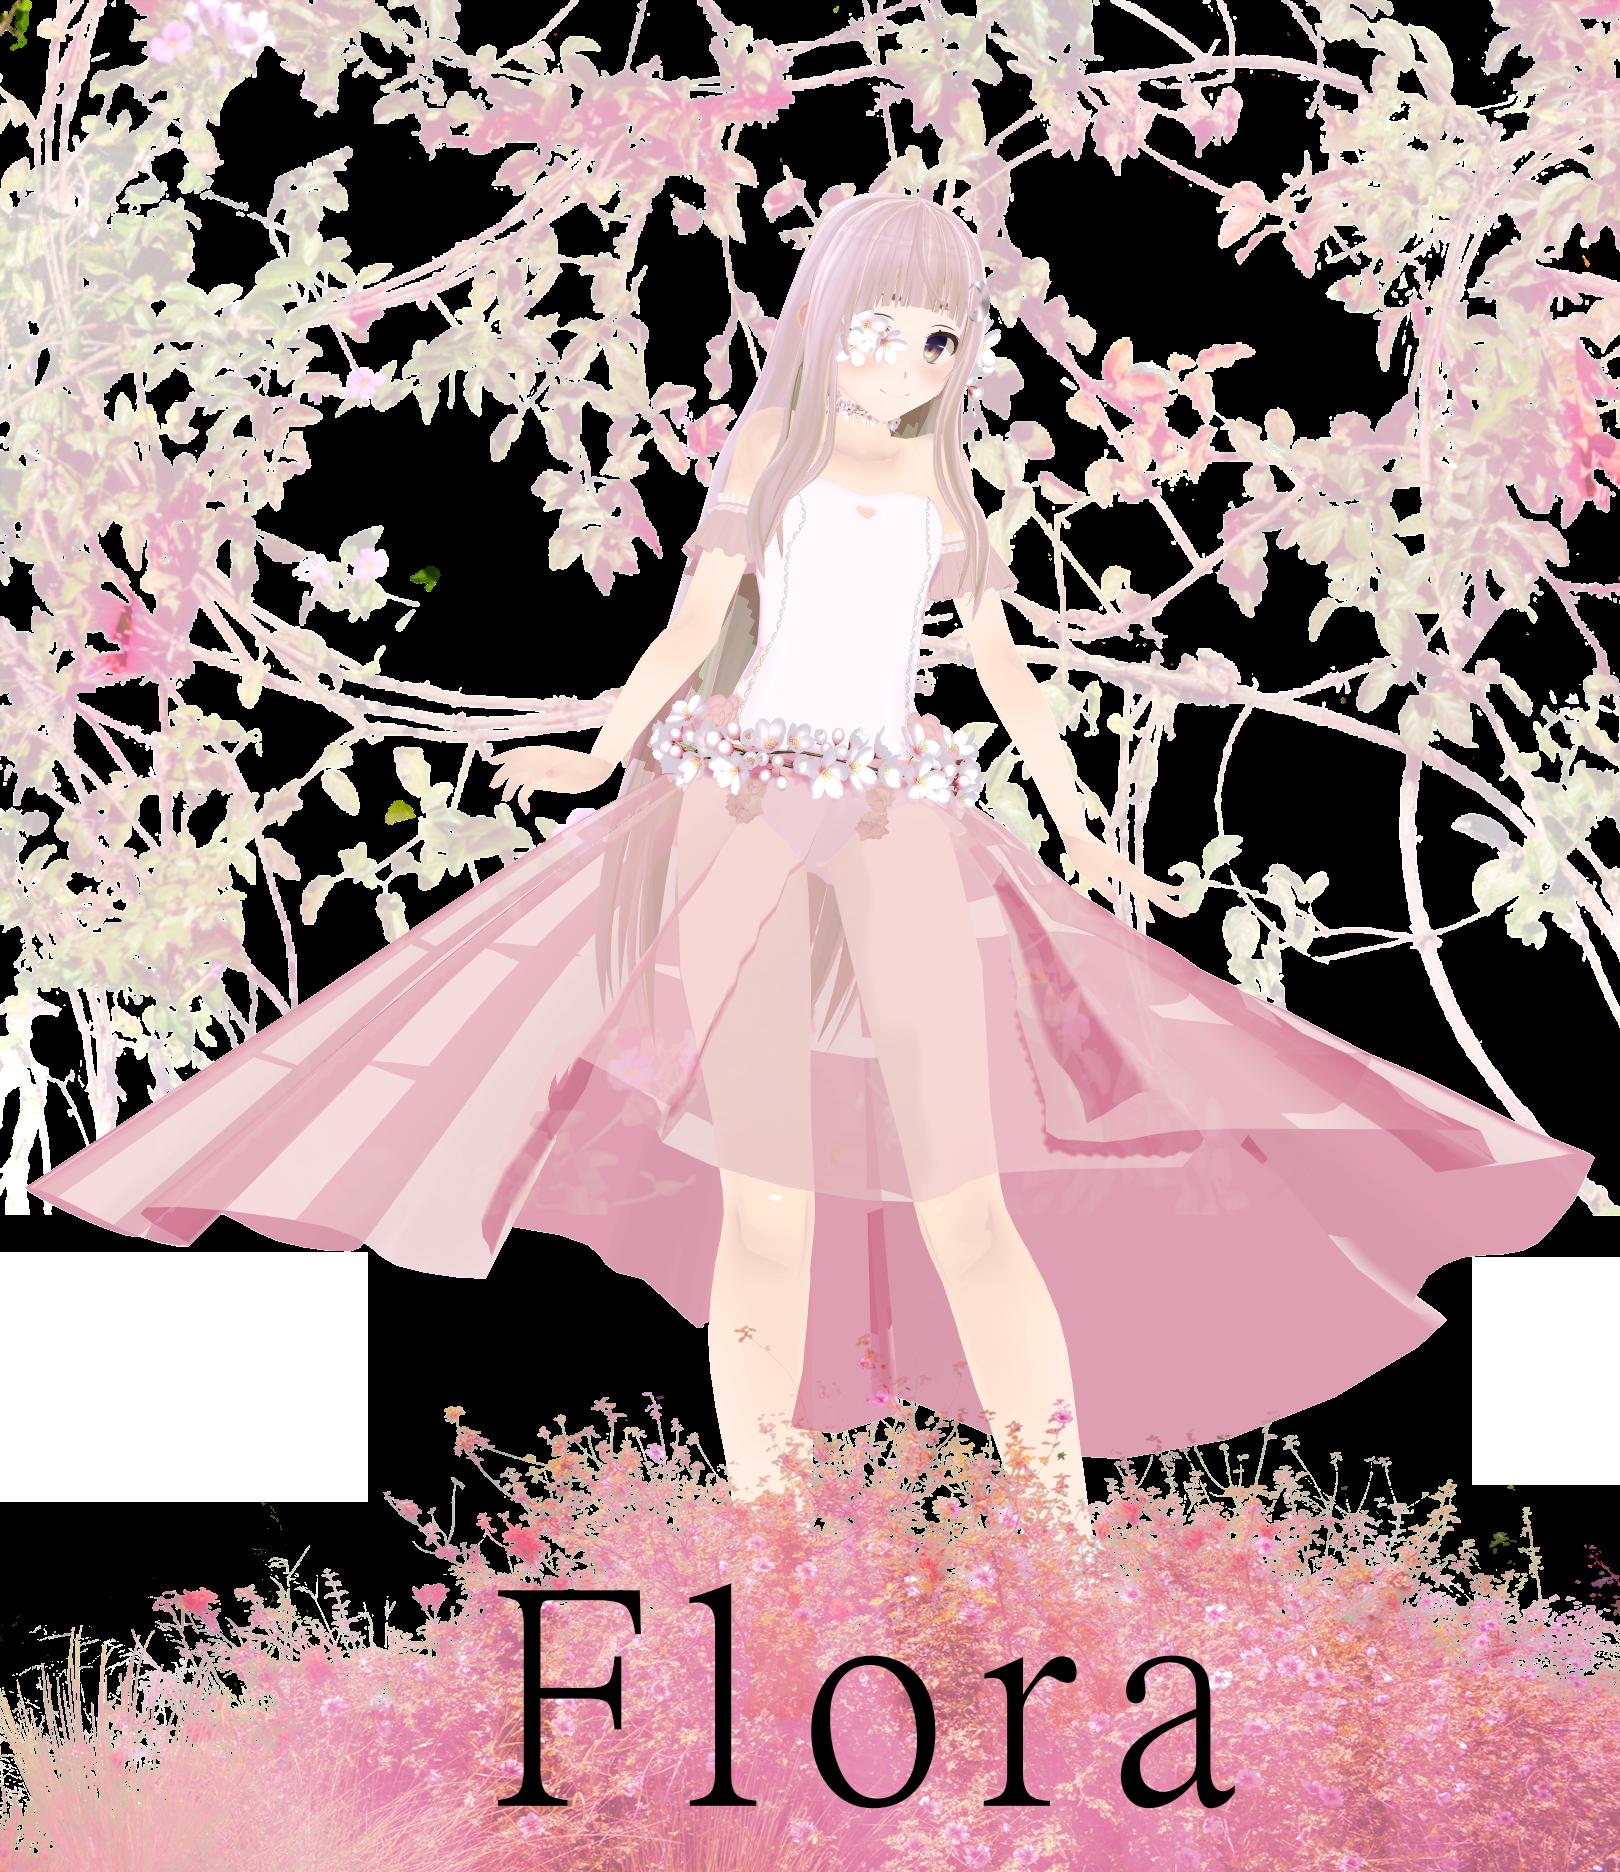 Flora Model Dl By Thos-beans On DeviantArt